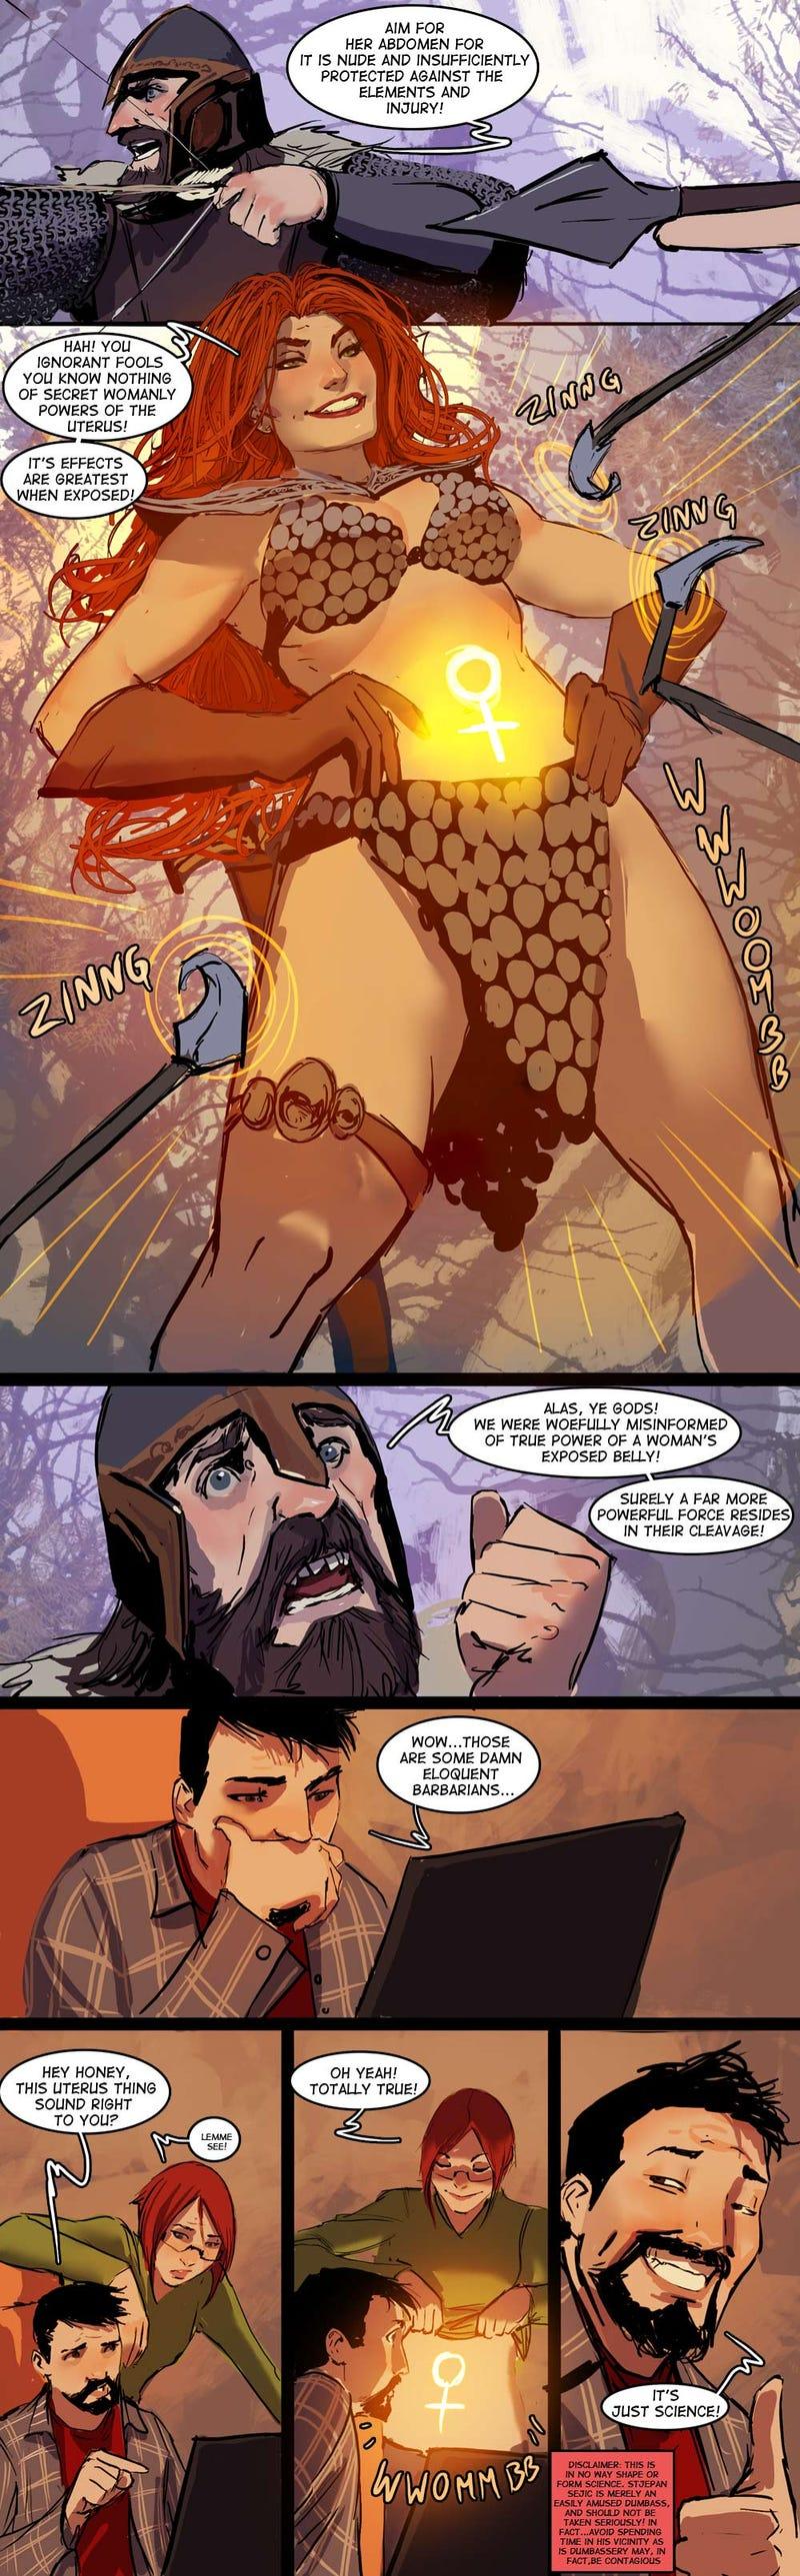 The real reason that women in fantasy art wear such skimpy armor